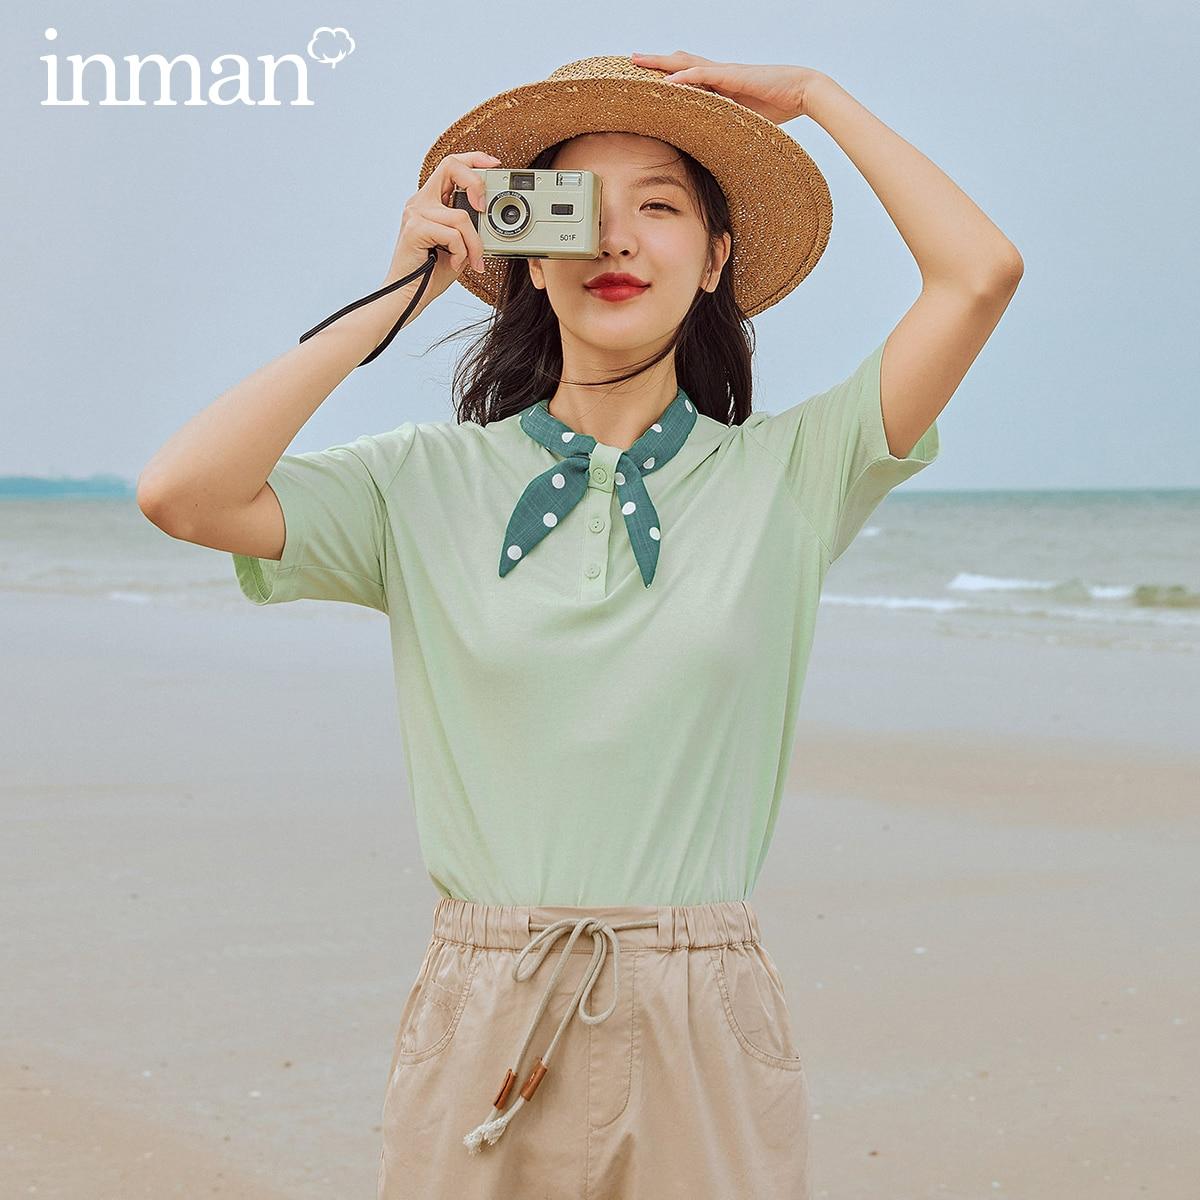 INMAN  Vintage T-Shirt 2020 New Arrival Loose Style Polka Dot  Collar Artsy Women Tops